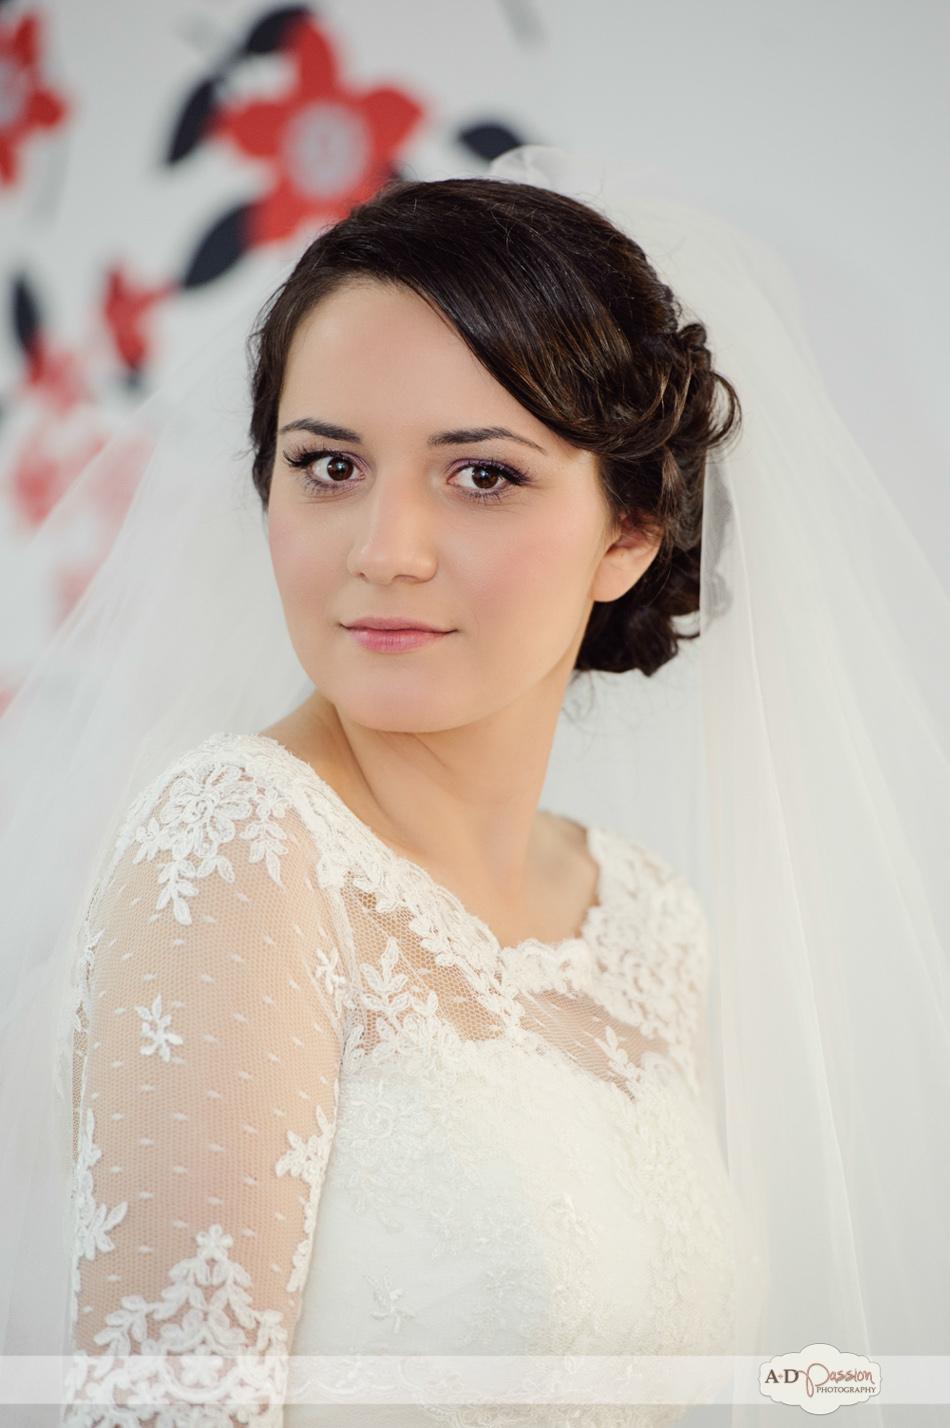 AD Passion Photography | fotograf-nunta_flavian-si-alina_nunta-targu-mures_0016 | Adelin, Dida, fotograf profesionist, fotograf de nunta, fotografie de nunta, fotograf Timisoara, fotograf Craiova, fotograf Bucuresti, fotograf Arad, nunta Timisoara, nunta Arad, nunta Bucuresti, nunta Craiova